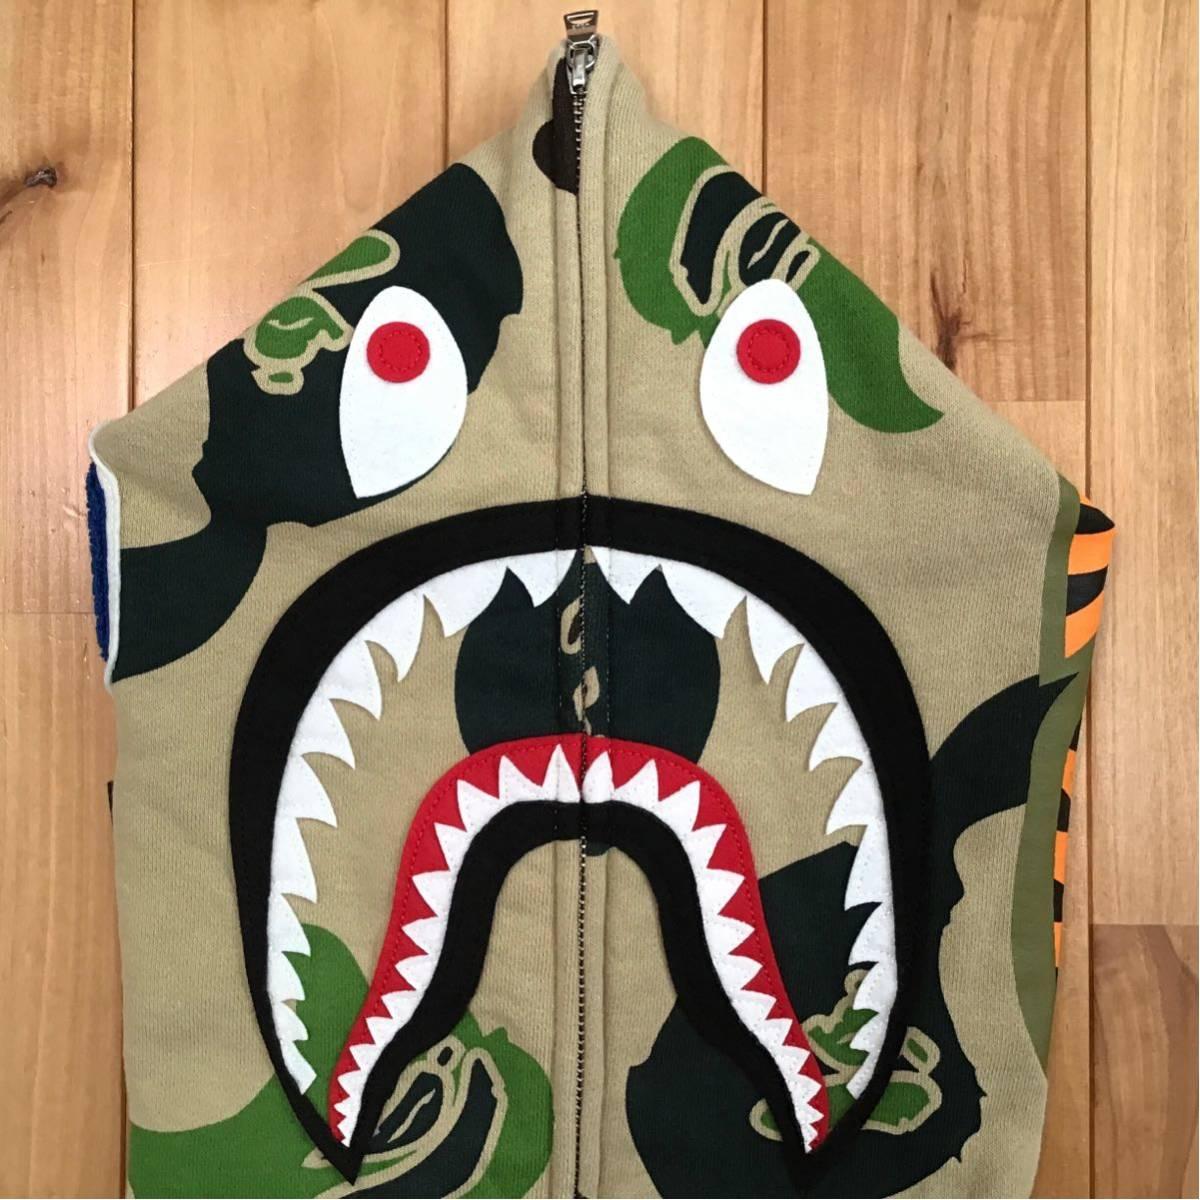 Def camo シャーク パーカー Mサイズ shark full zip hoodie a bathing ape bape エイプ ベイプ アベイシングエイプ 迷彩 WGM 232t